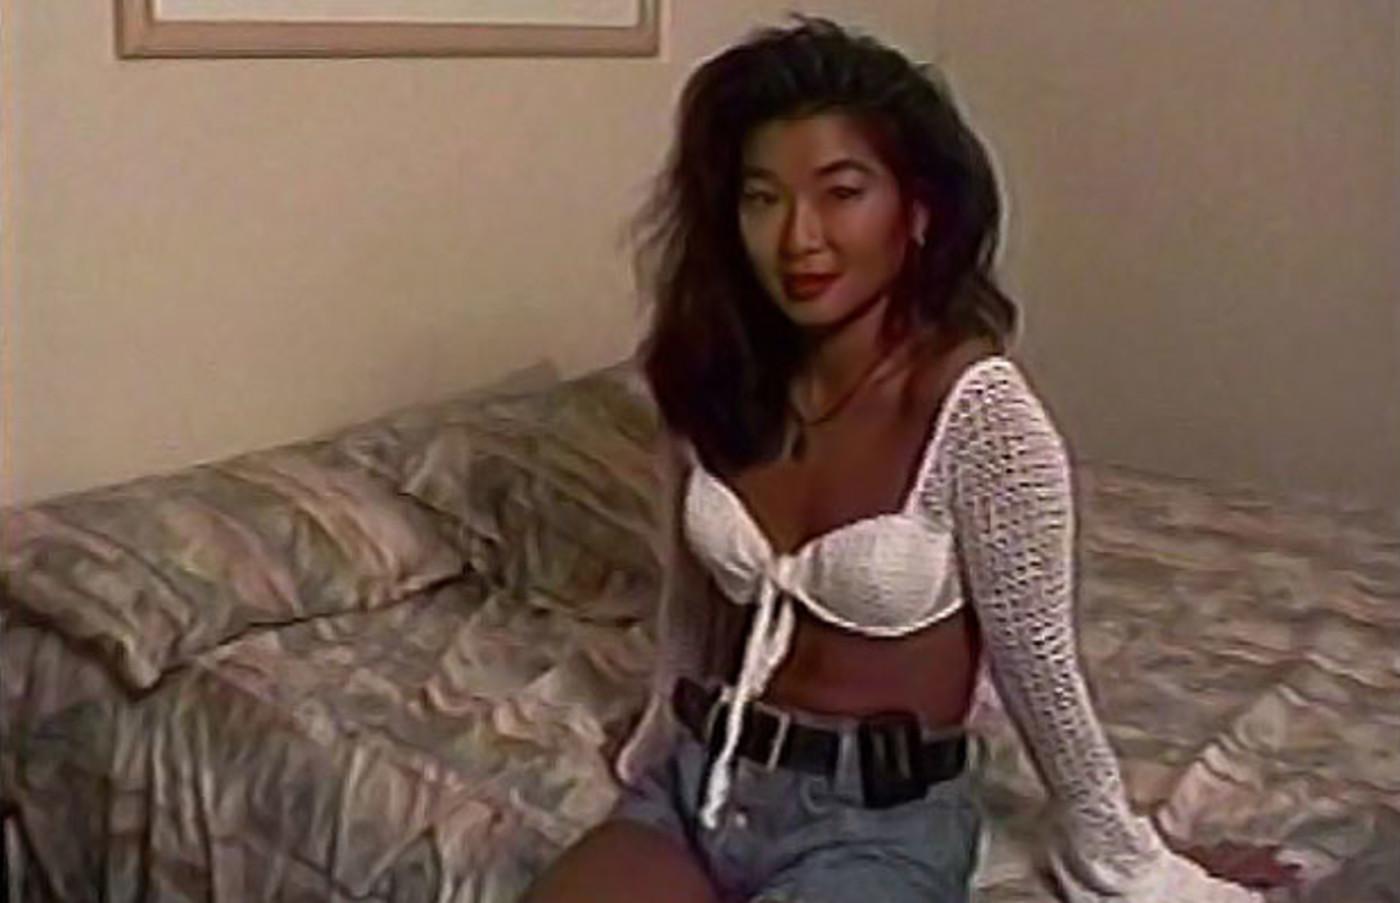 The Hottest Asian Pornstars | Complex